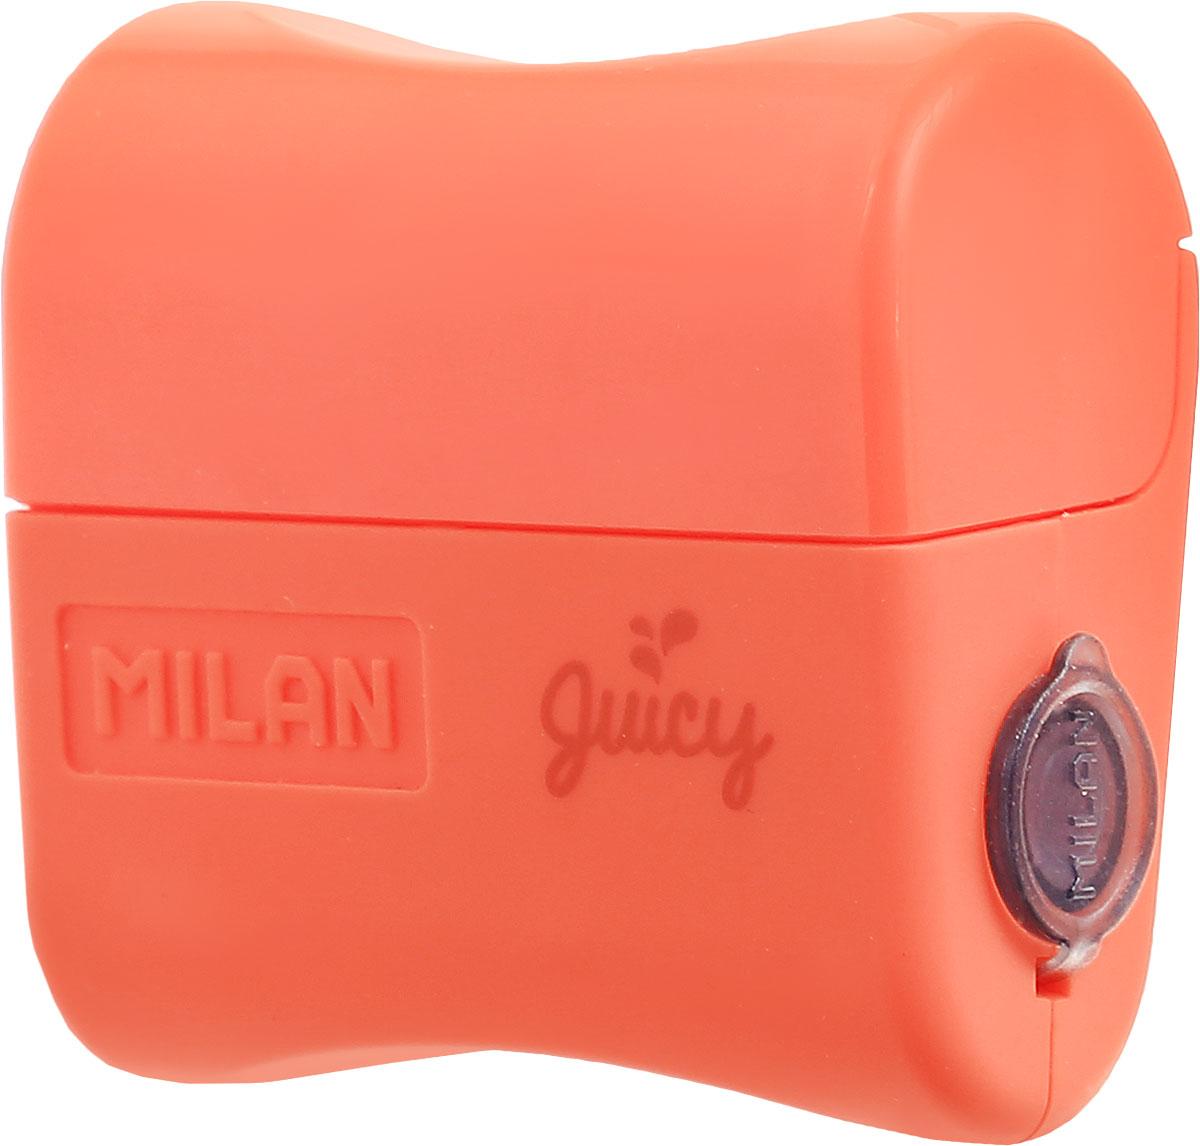 Milan Точилка Juicy с контейнером цвет оранжевый milan точилка 20127240